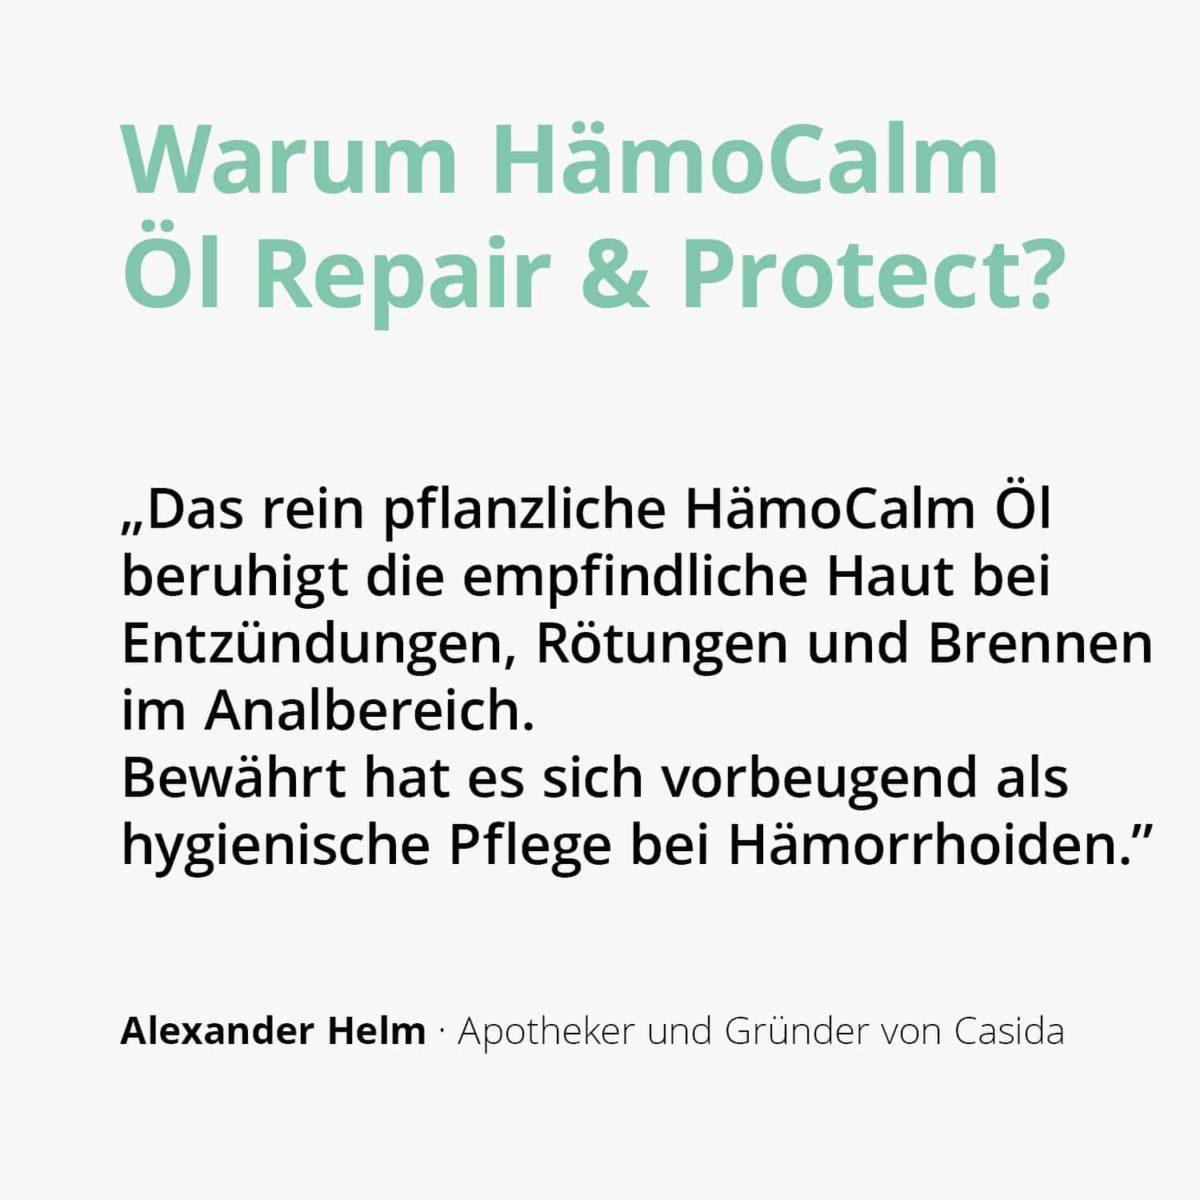 Casida HämoCalm Repair & Protect – 20 ml 10086675 PZN Apotheke hämorrhoiden hämmoritten hemoriden2